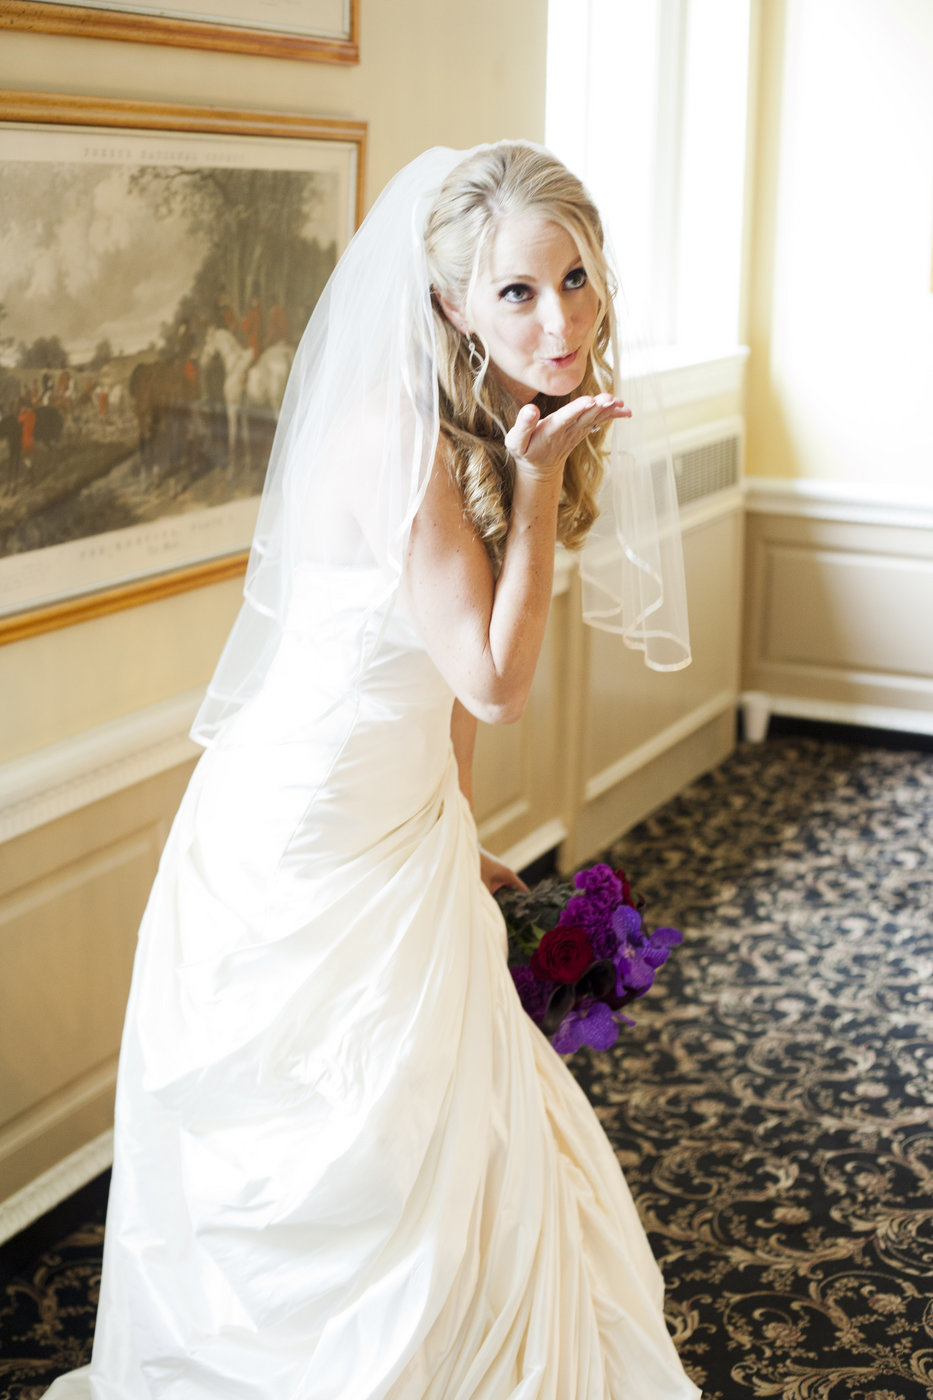 Bride Blowing Kiss